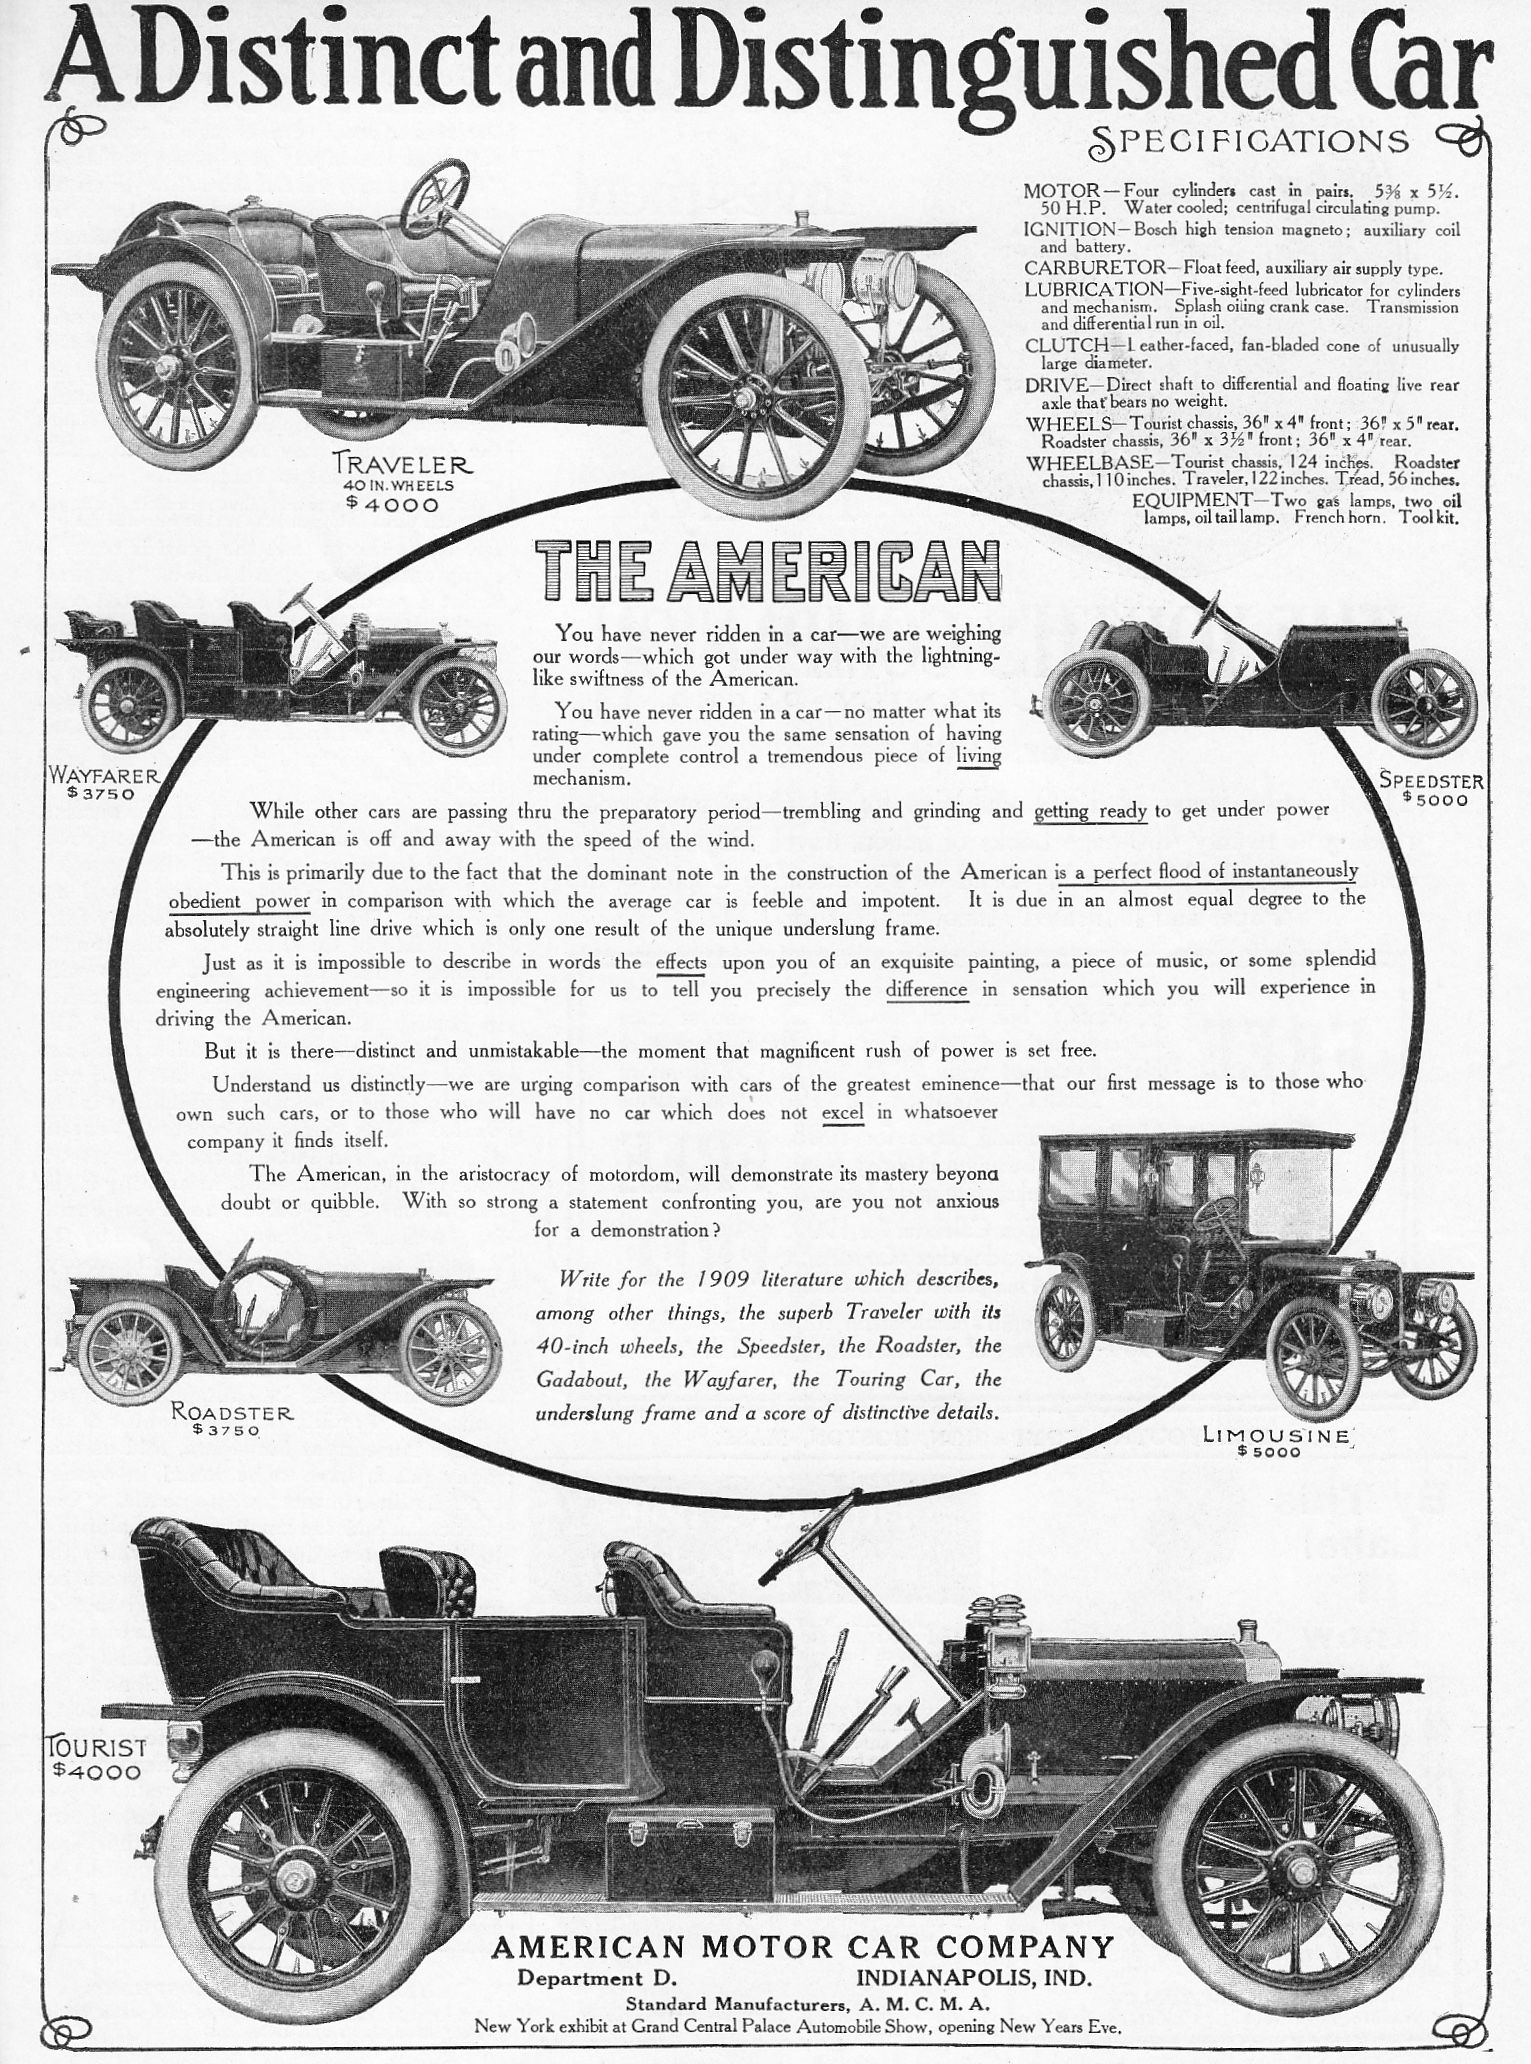 1908 American American Motor Car Company Chucks Converse